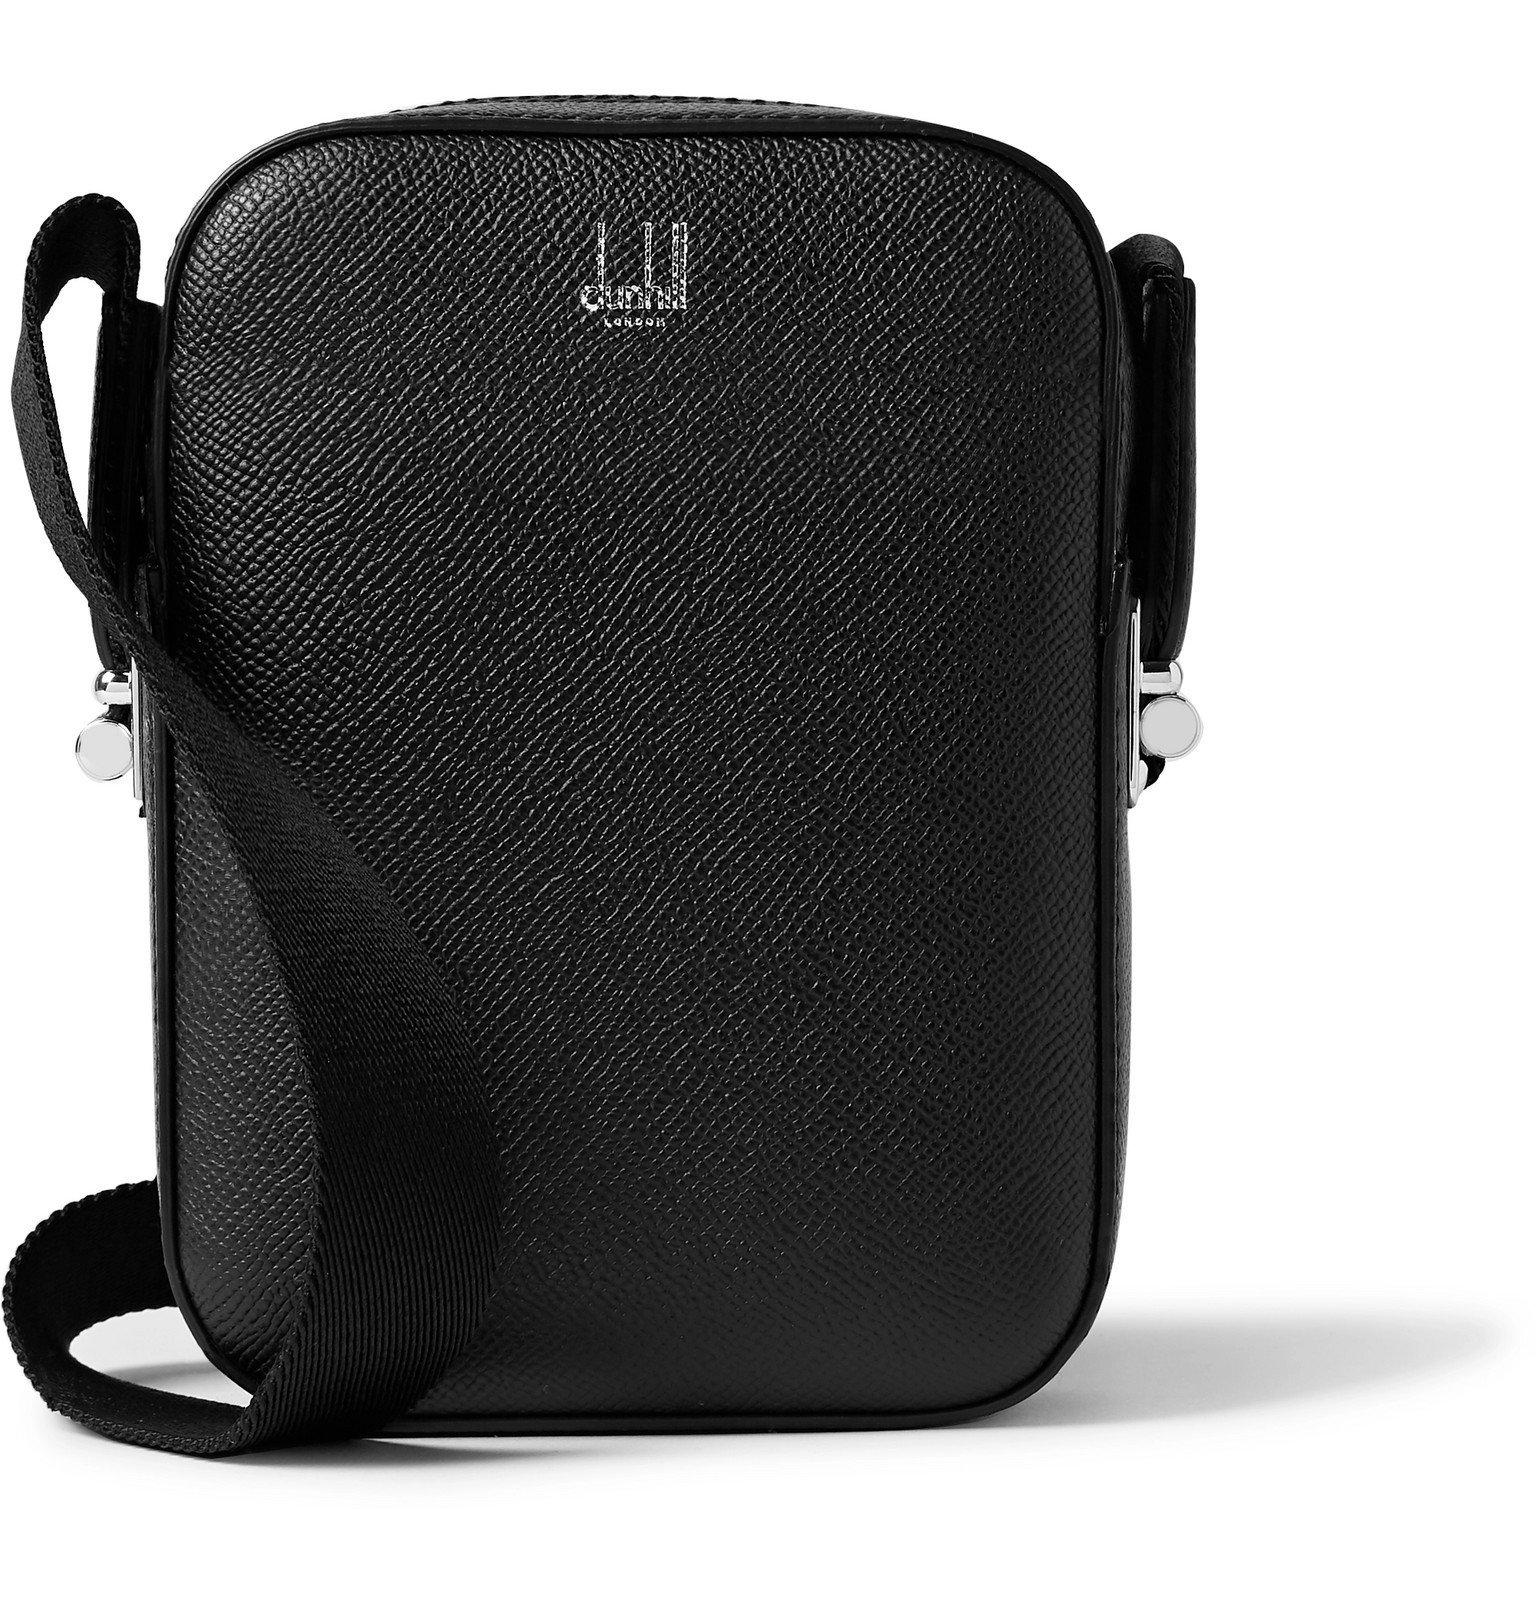 Dunhill - Cadogan Pebble-Grain Leather Messenger Bag - Black